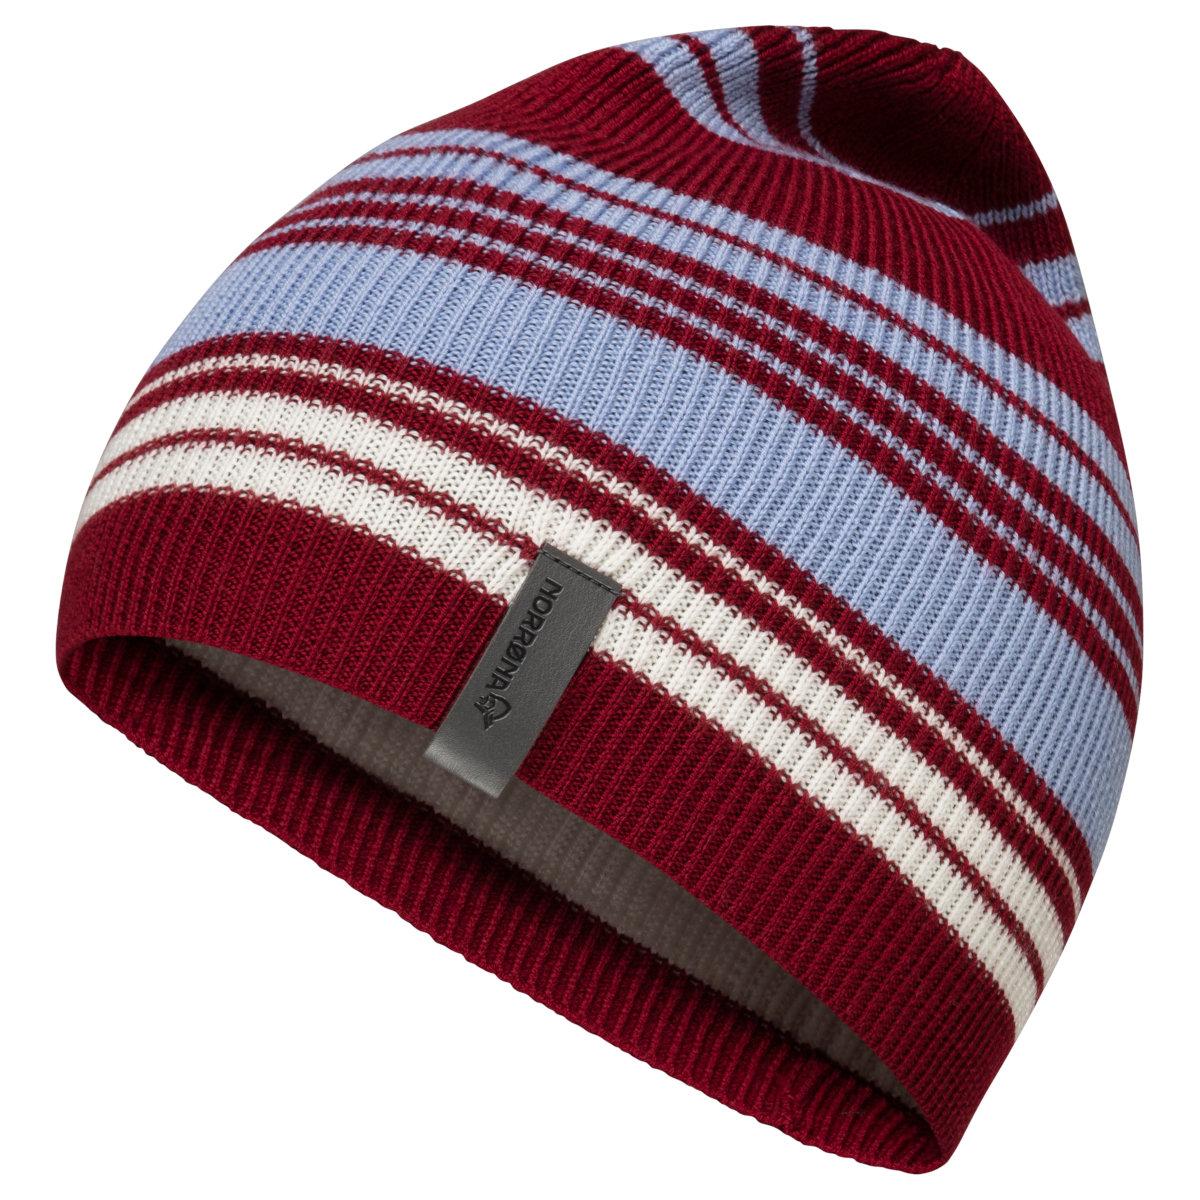 Norrona /29 striped light weight Beanie - Rhubarb